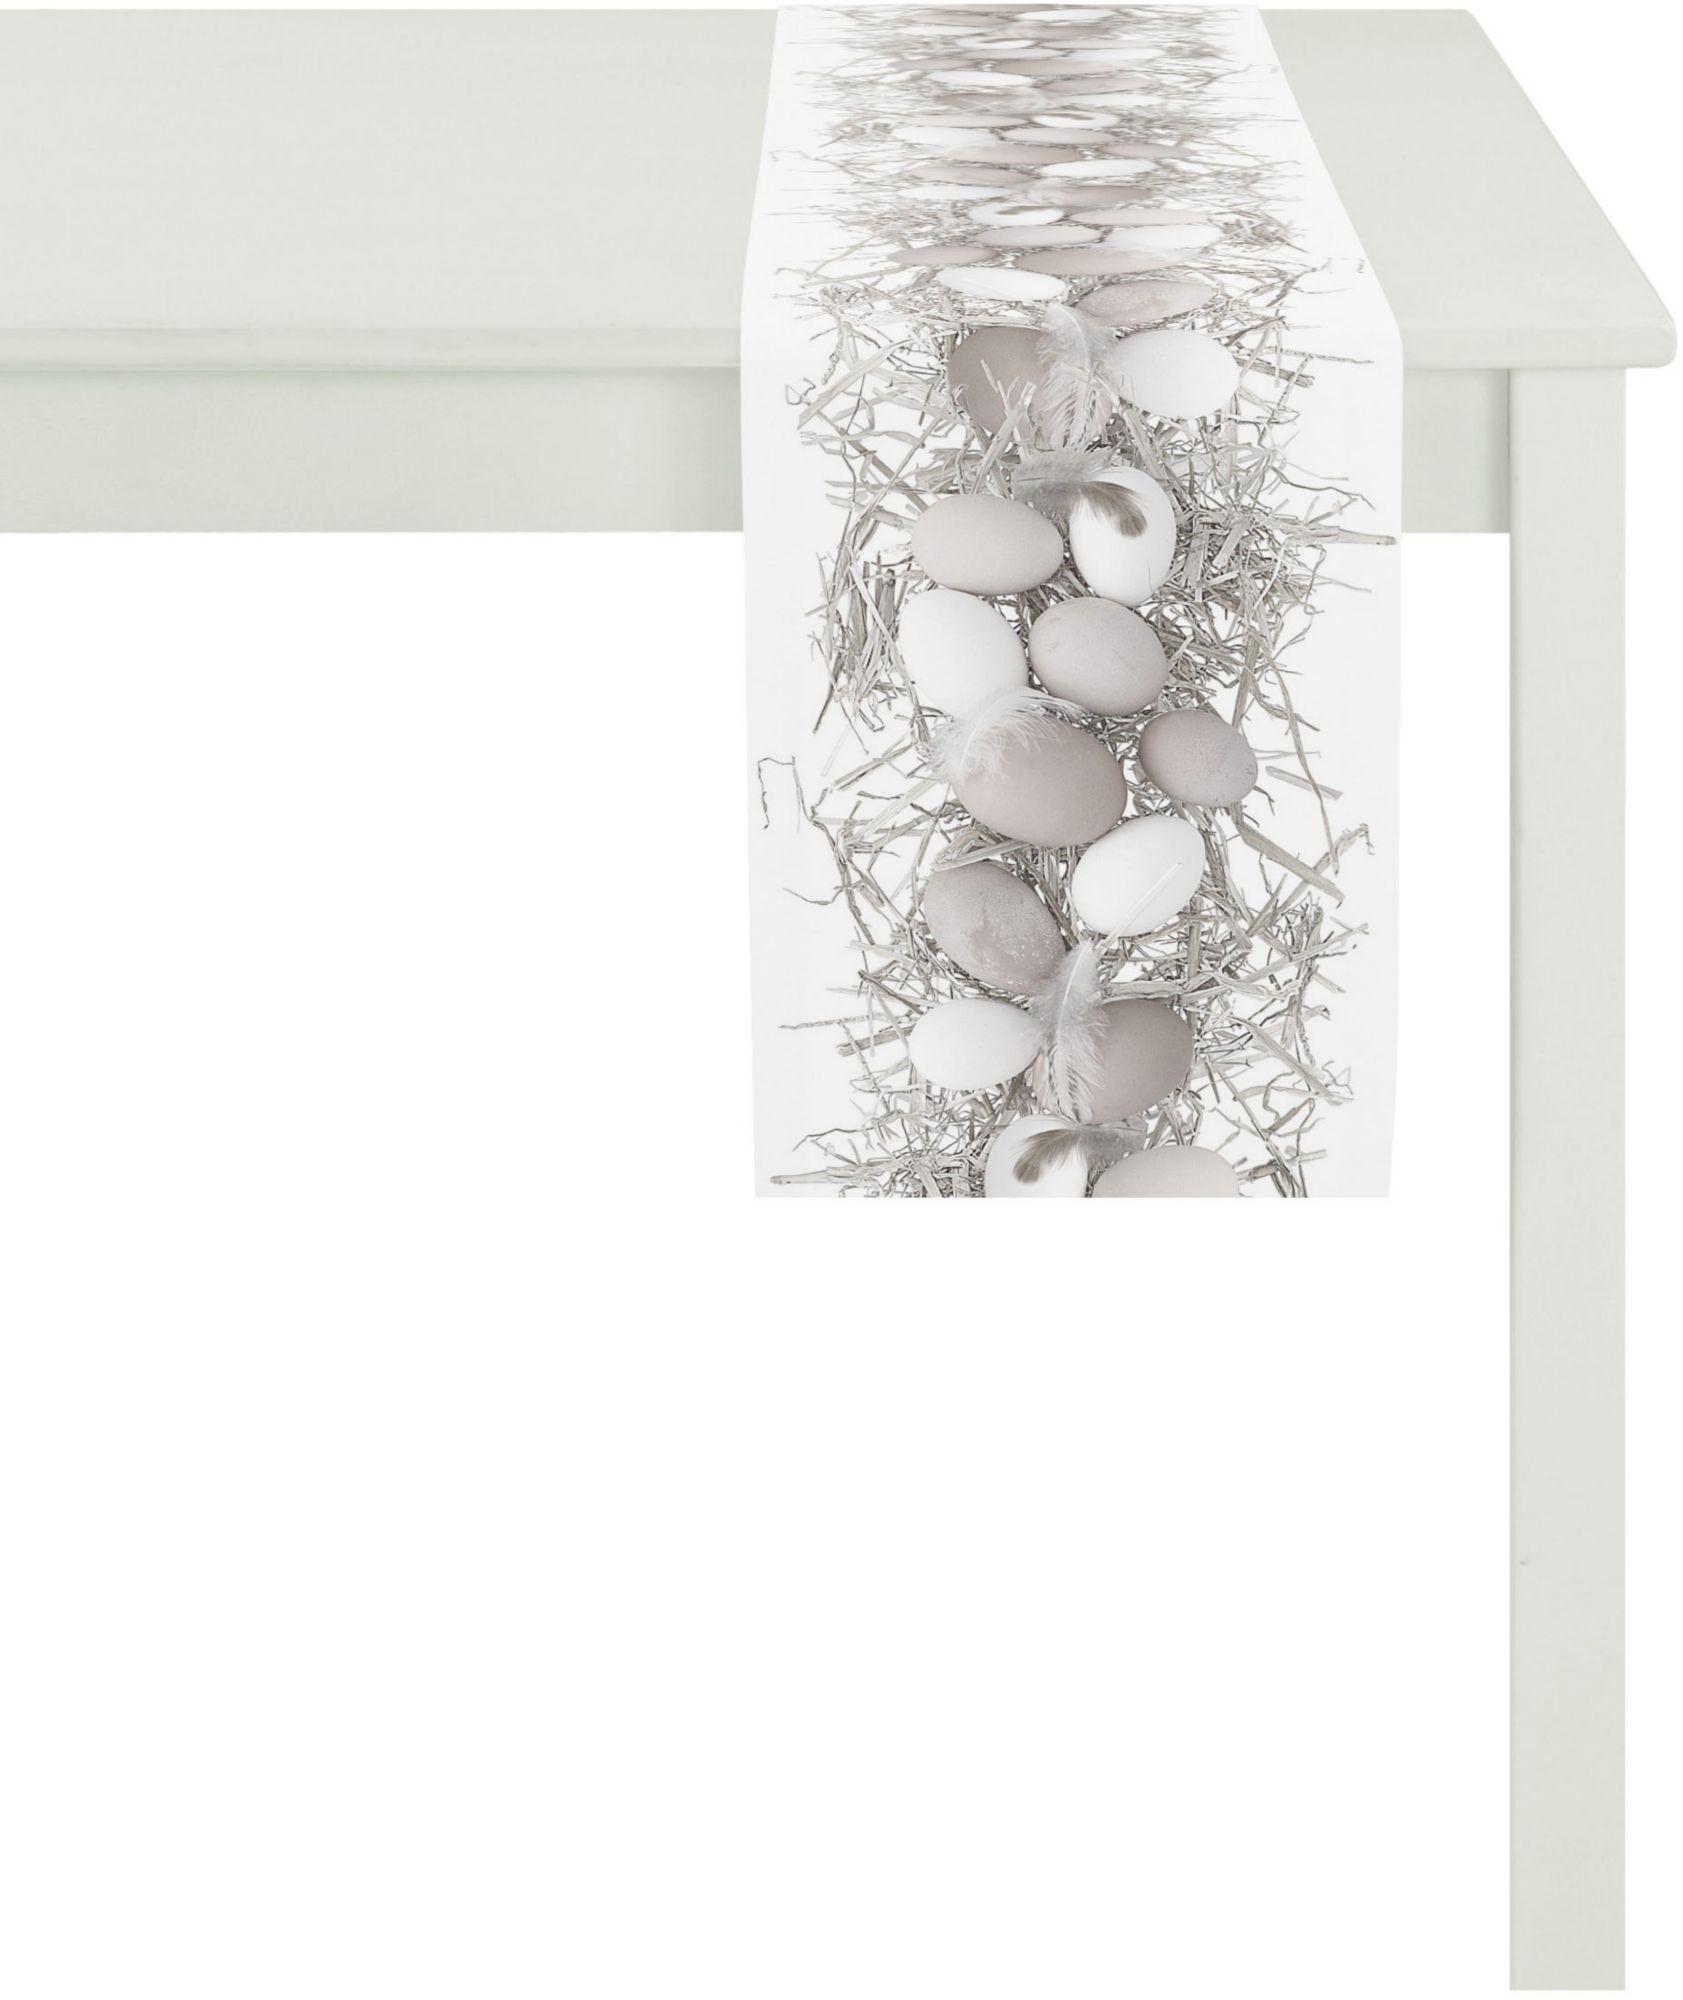 APELT Apelt Tischband, 25x175 cm, »2205 HAPPY EASTER«